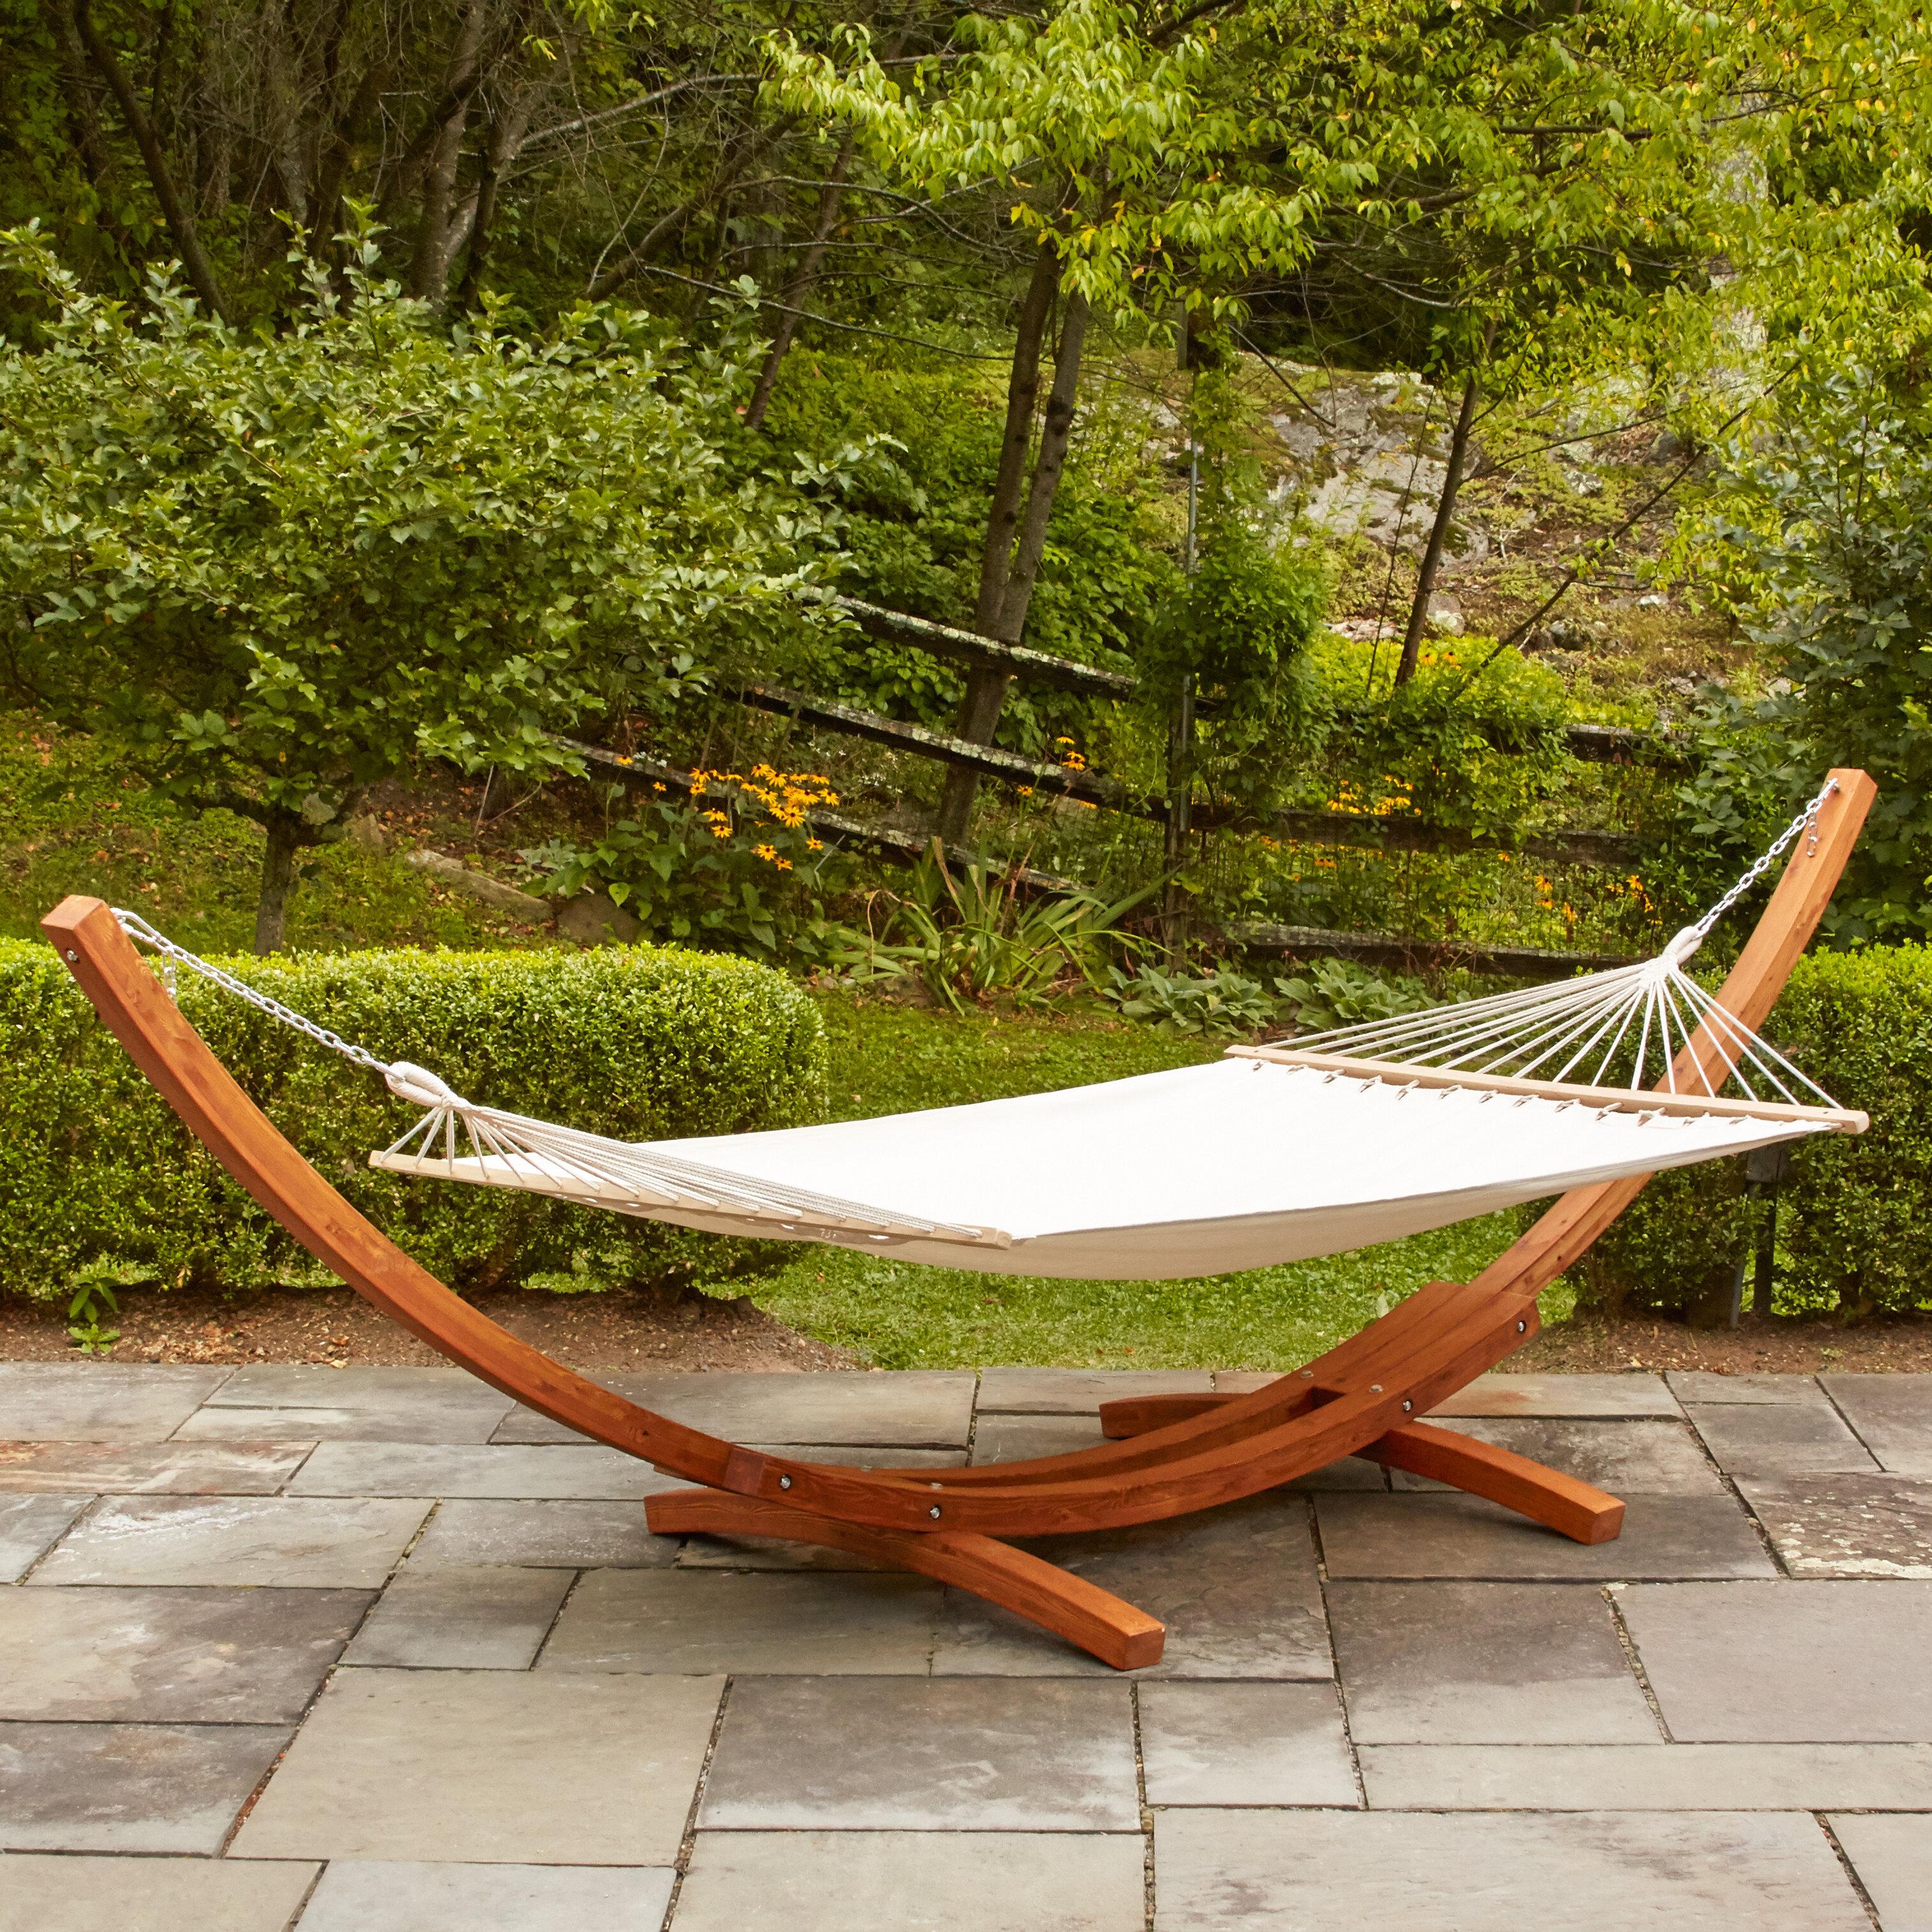 com hangers nicolasprudhon single a hammock camping with hillbilly tree